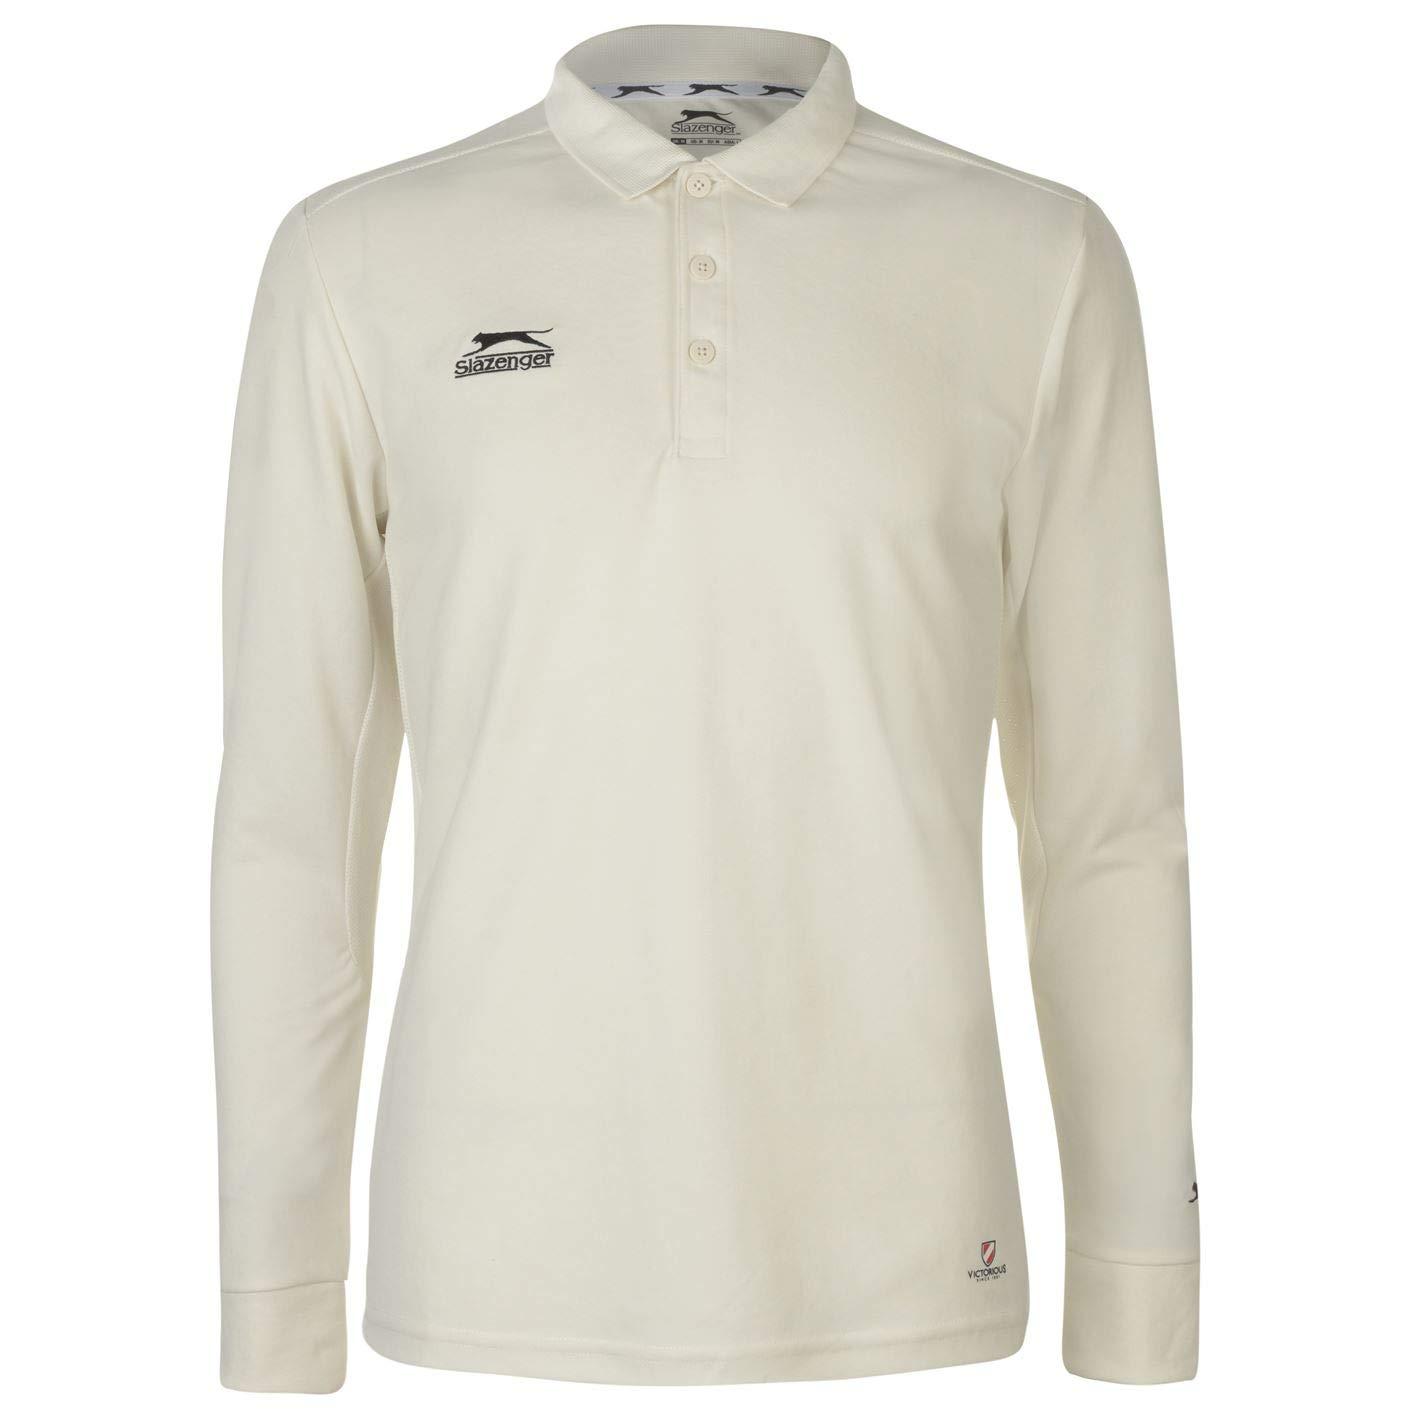 Slazenger Hombre Long Sleeve Camiseta De Críquet: Amazon.es: Ropa ...